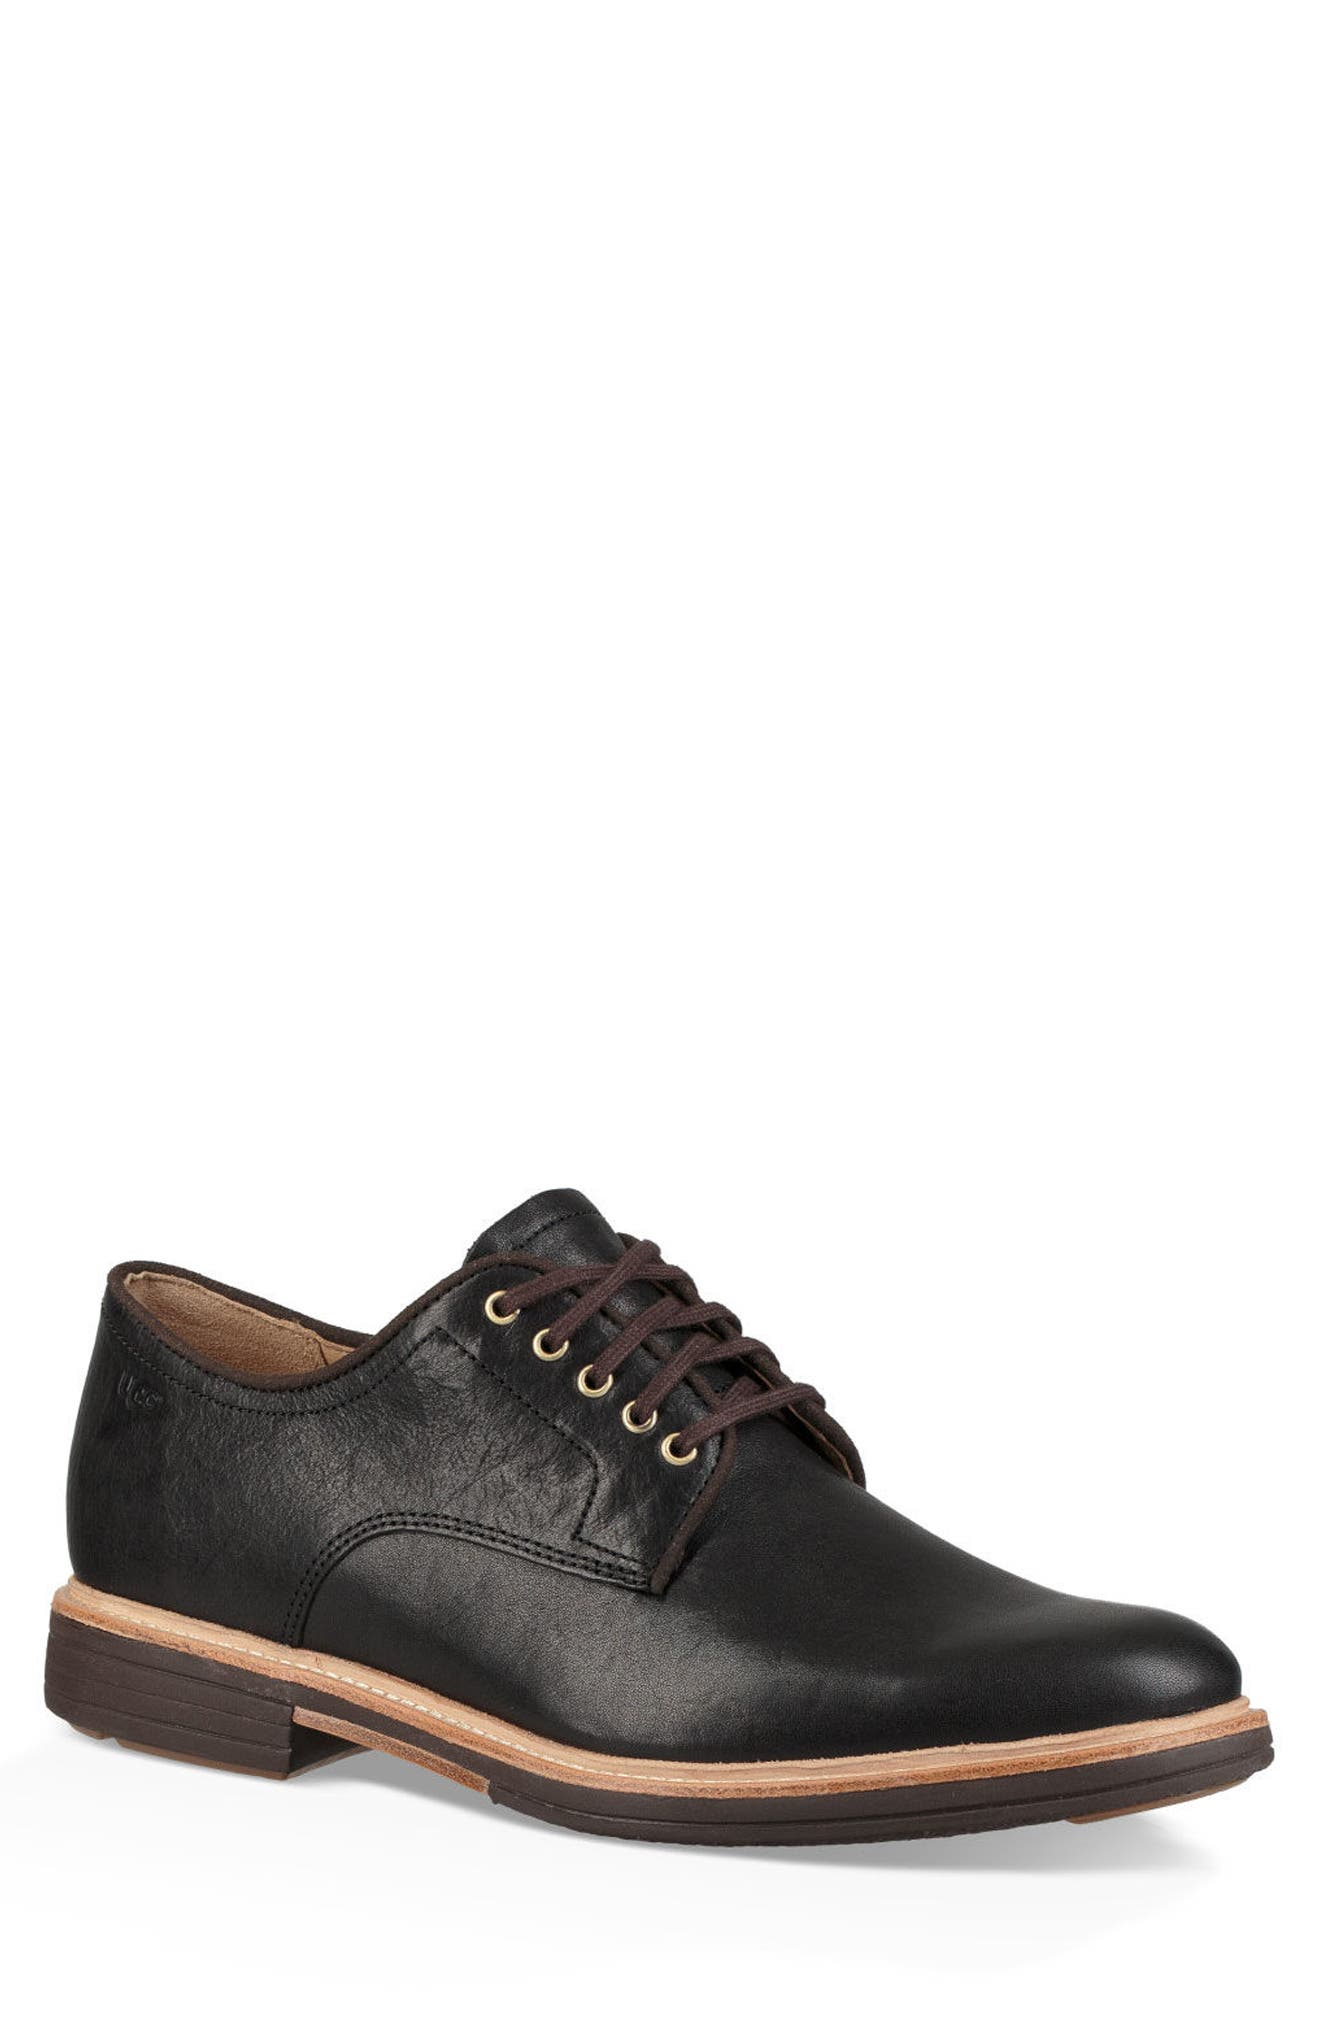 Jovin Buck Shoe,                         Main,                         color, 002